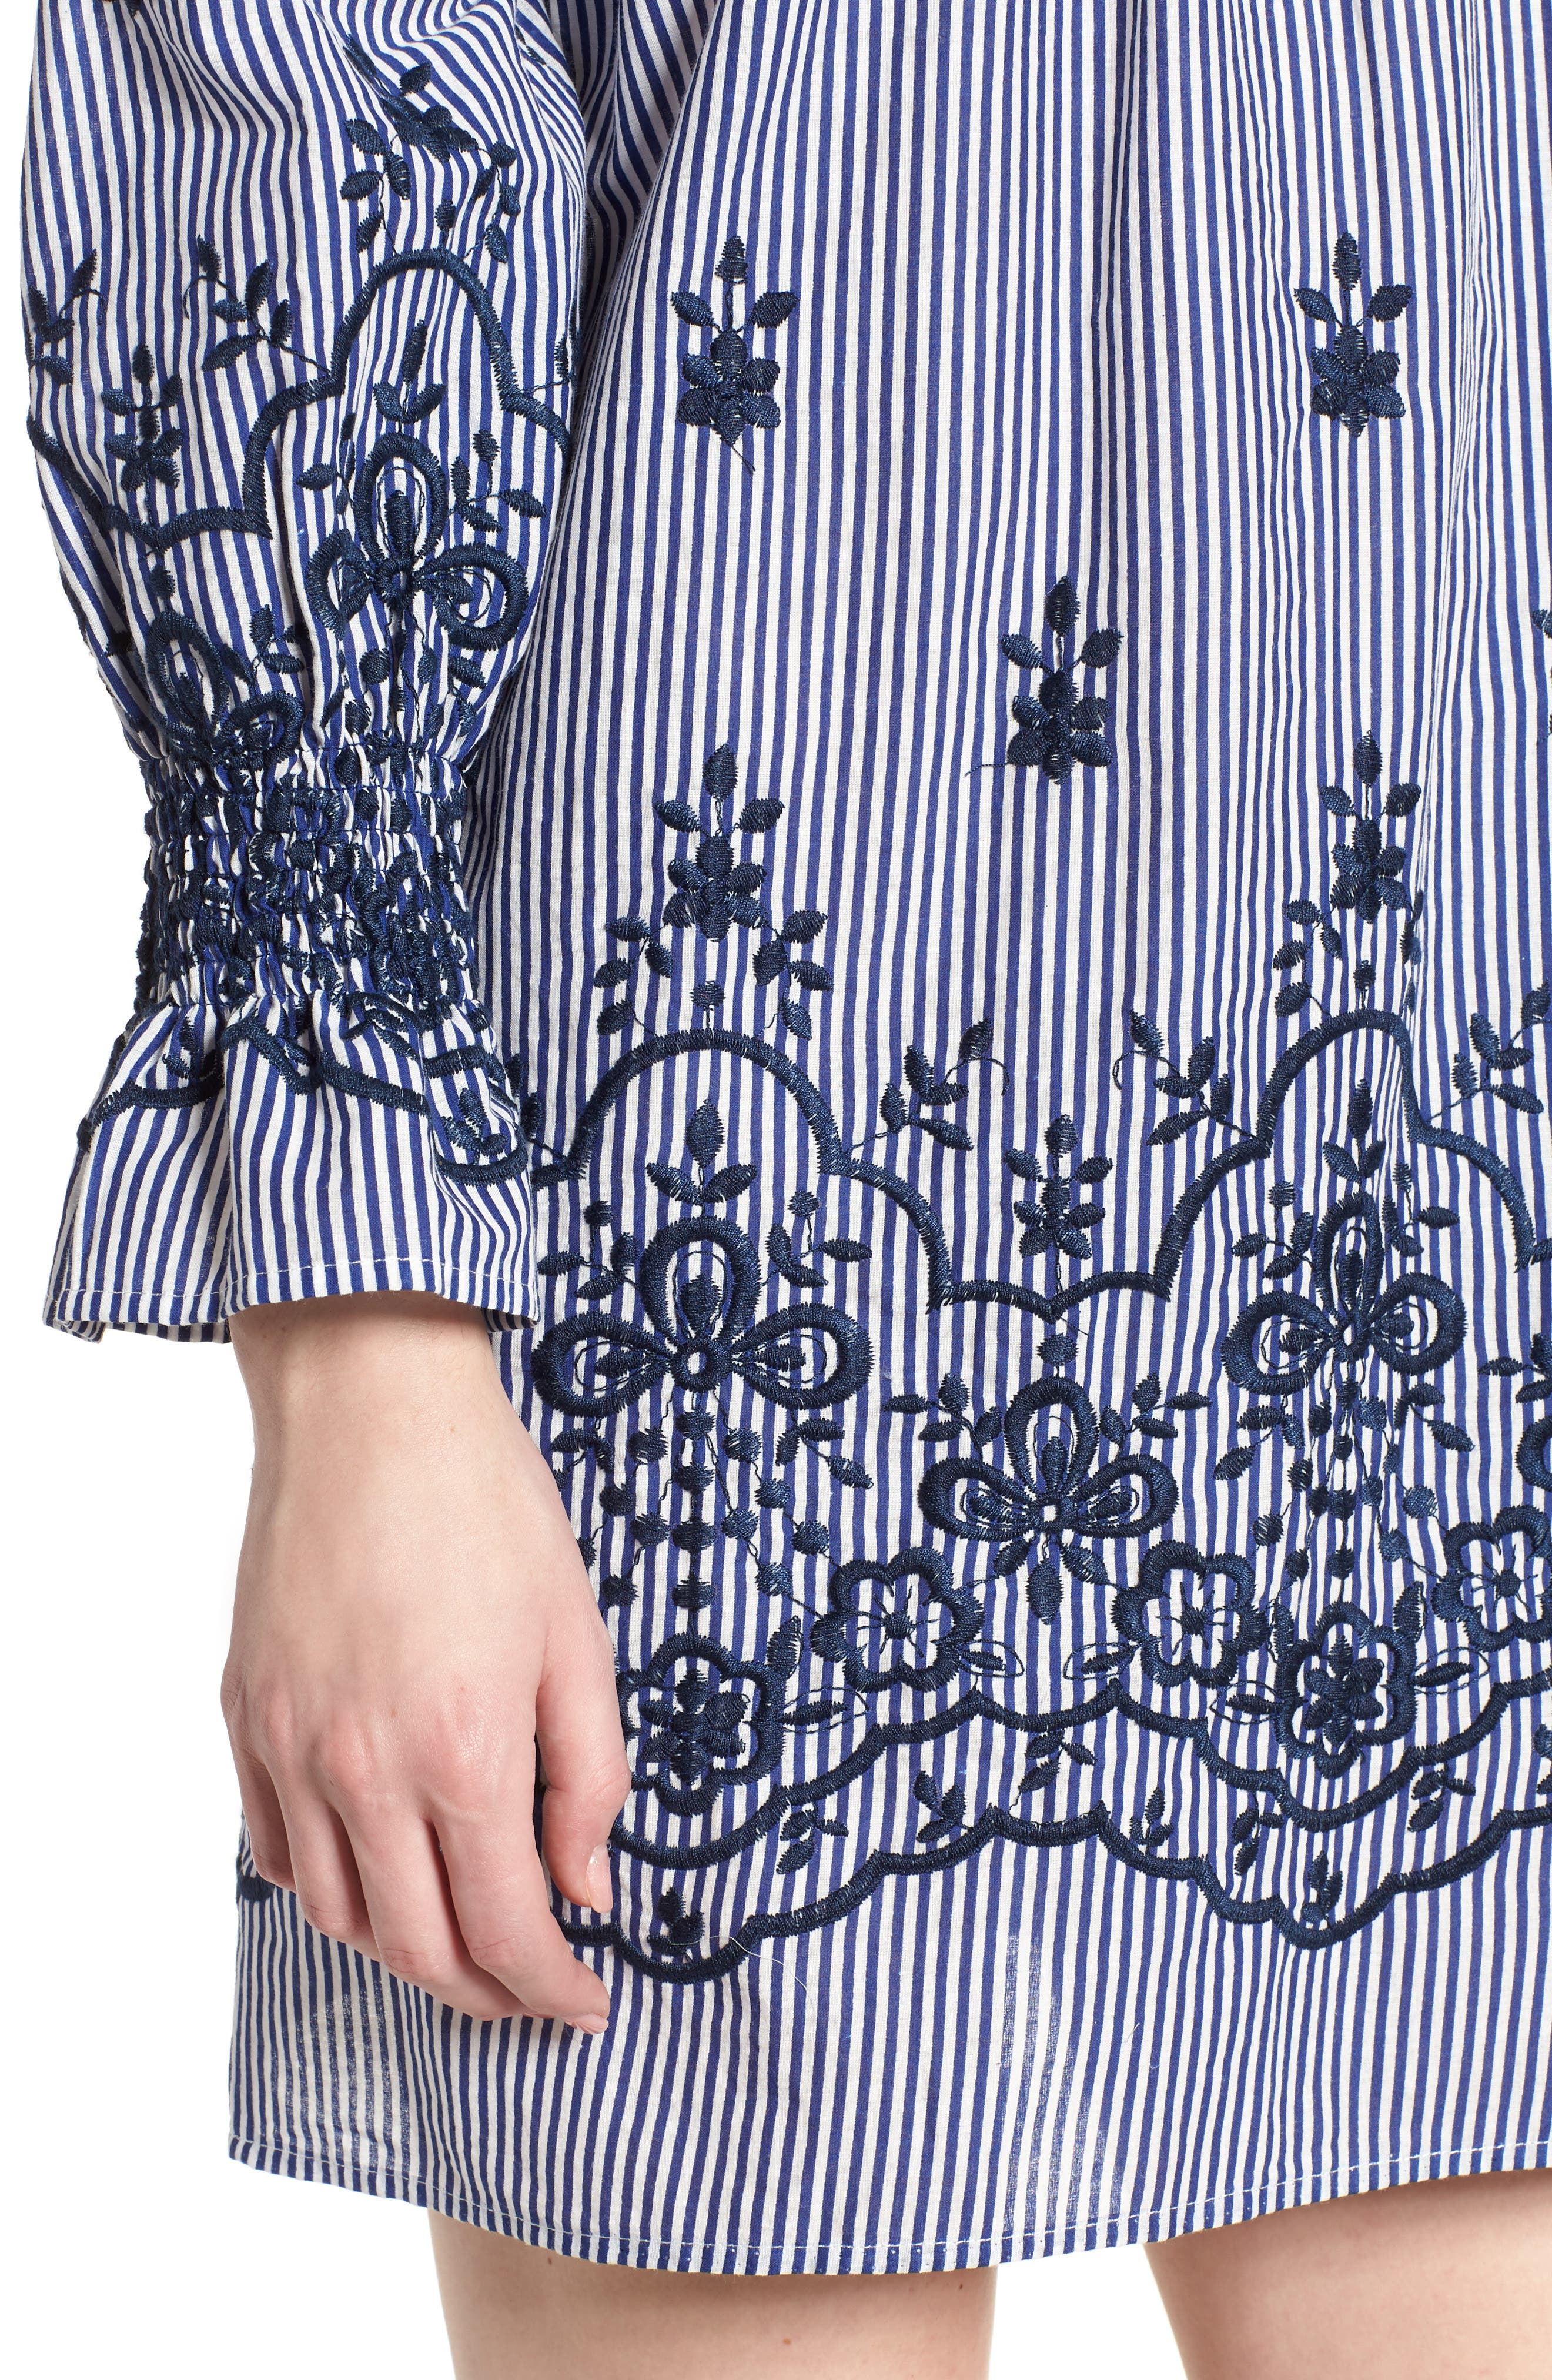 Bishop + Young Stripe Embroidered Off the Shoulder Dress,                             Alternate thumbnail 4, color,